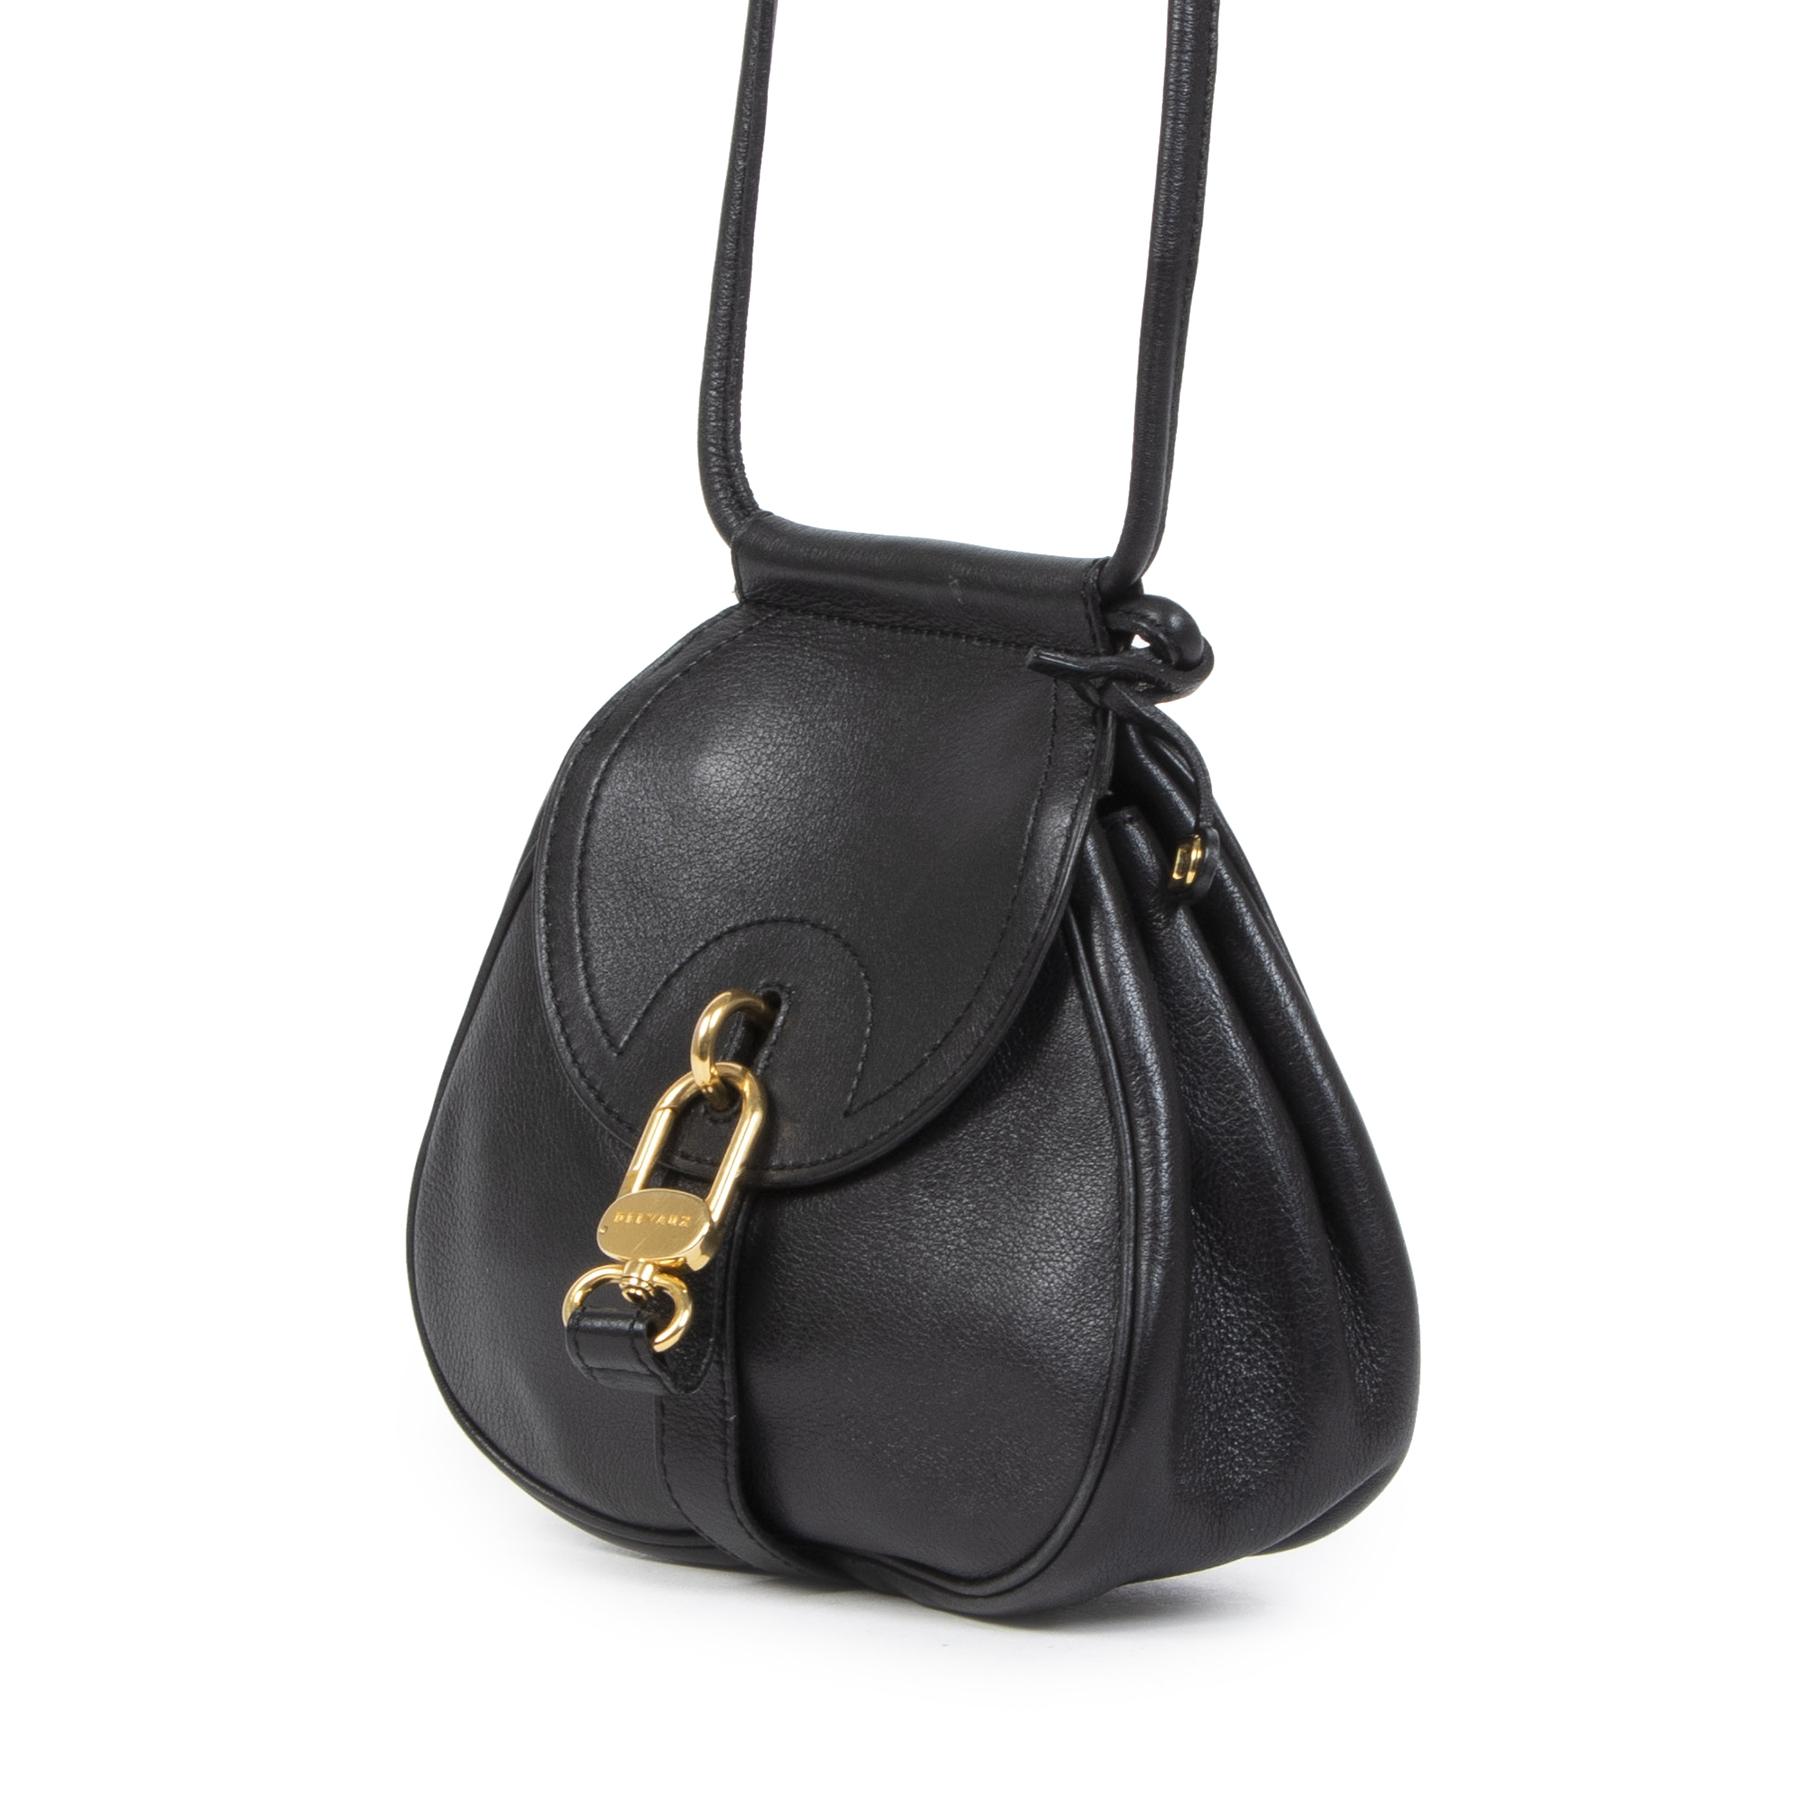 Authentieke tweedehands vintage Delvaux Black Mini Cerceau Crossbody Bag koop online webshop LabelLOV